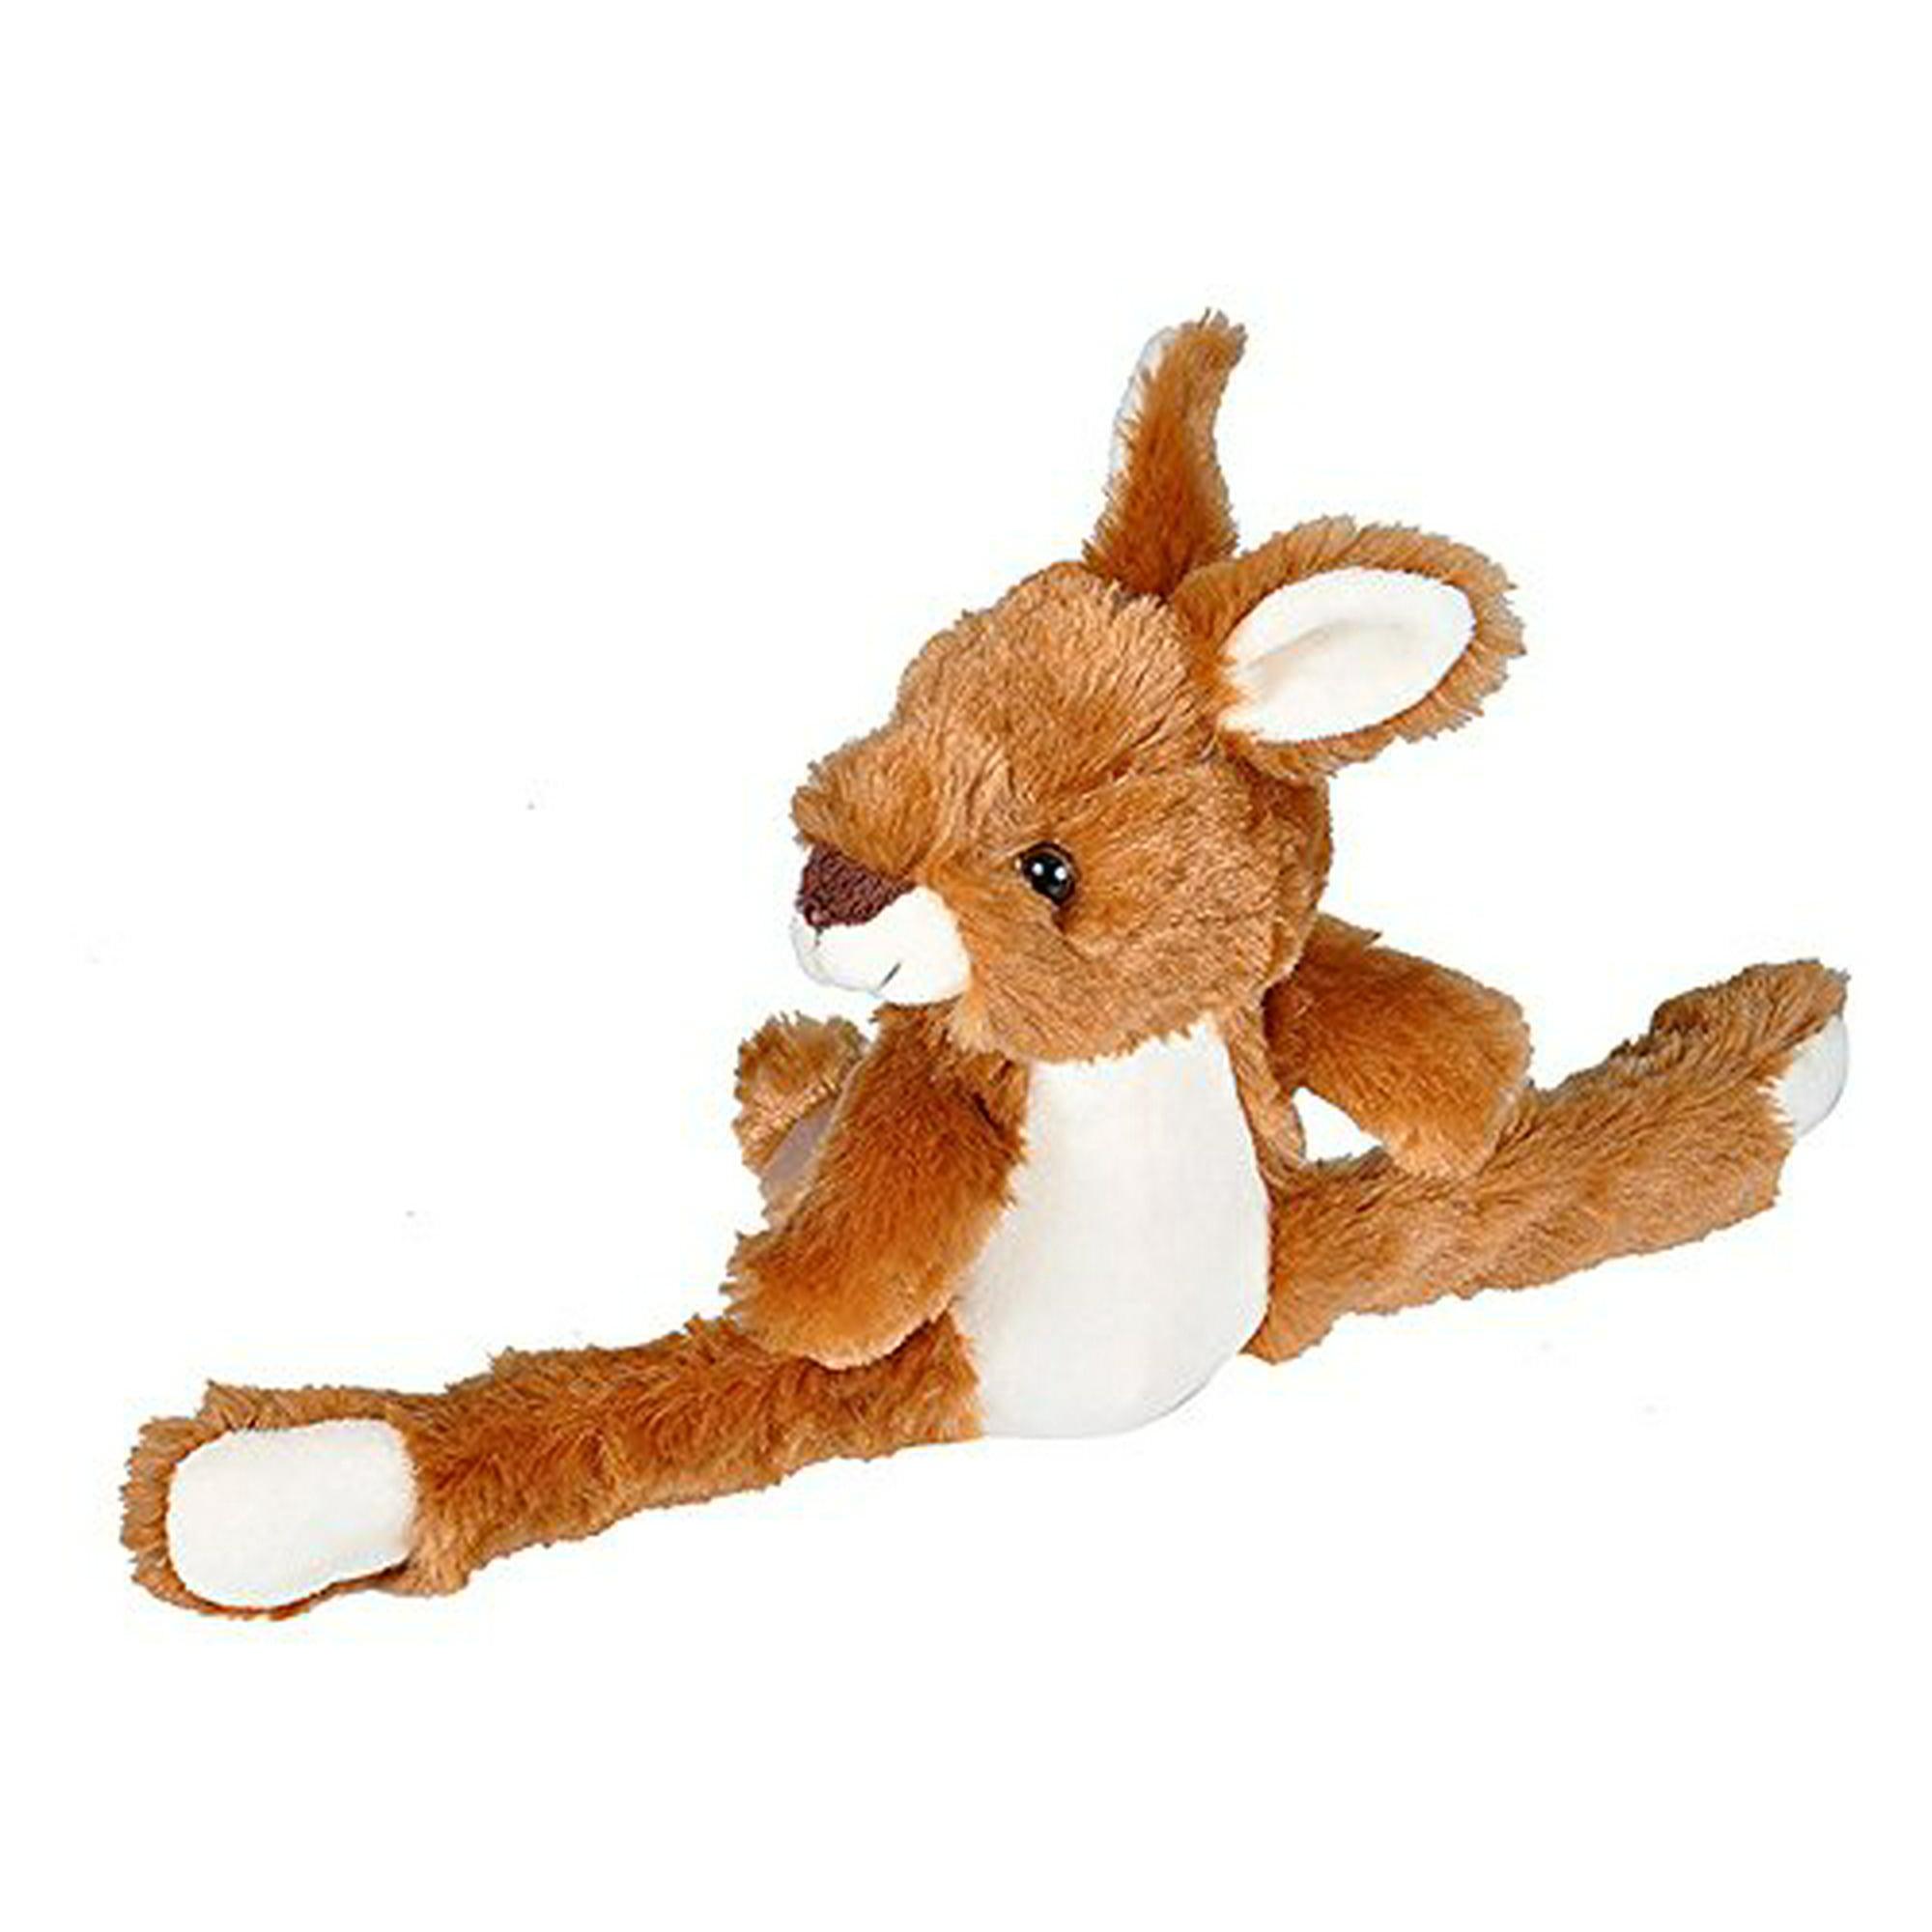 Best Stuffed Animals For Boy, Wild Republic Huggers Kangaroo Plush Toy Slap Bracelet Stuffed Animal Kids Toys 8 Inches Walmart Canada